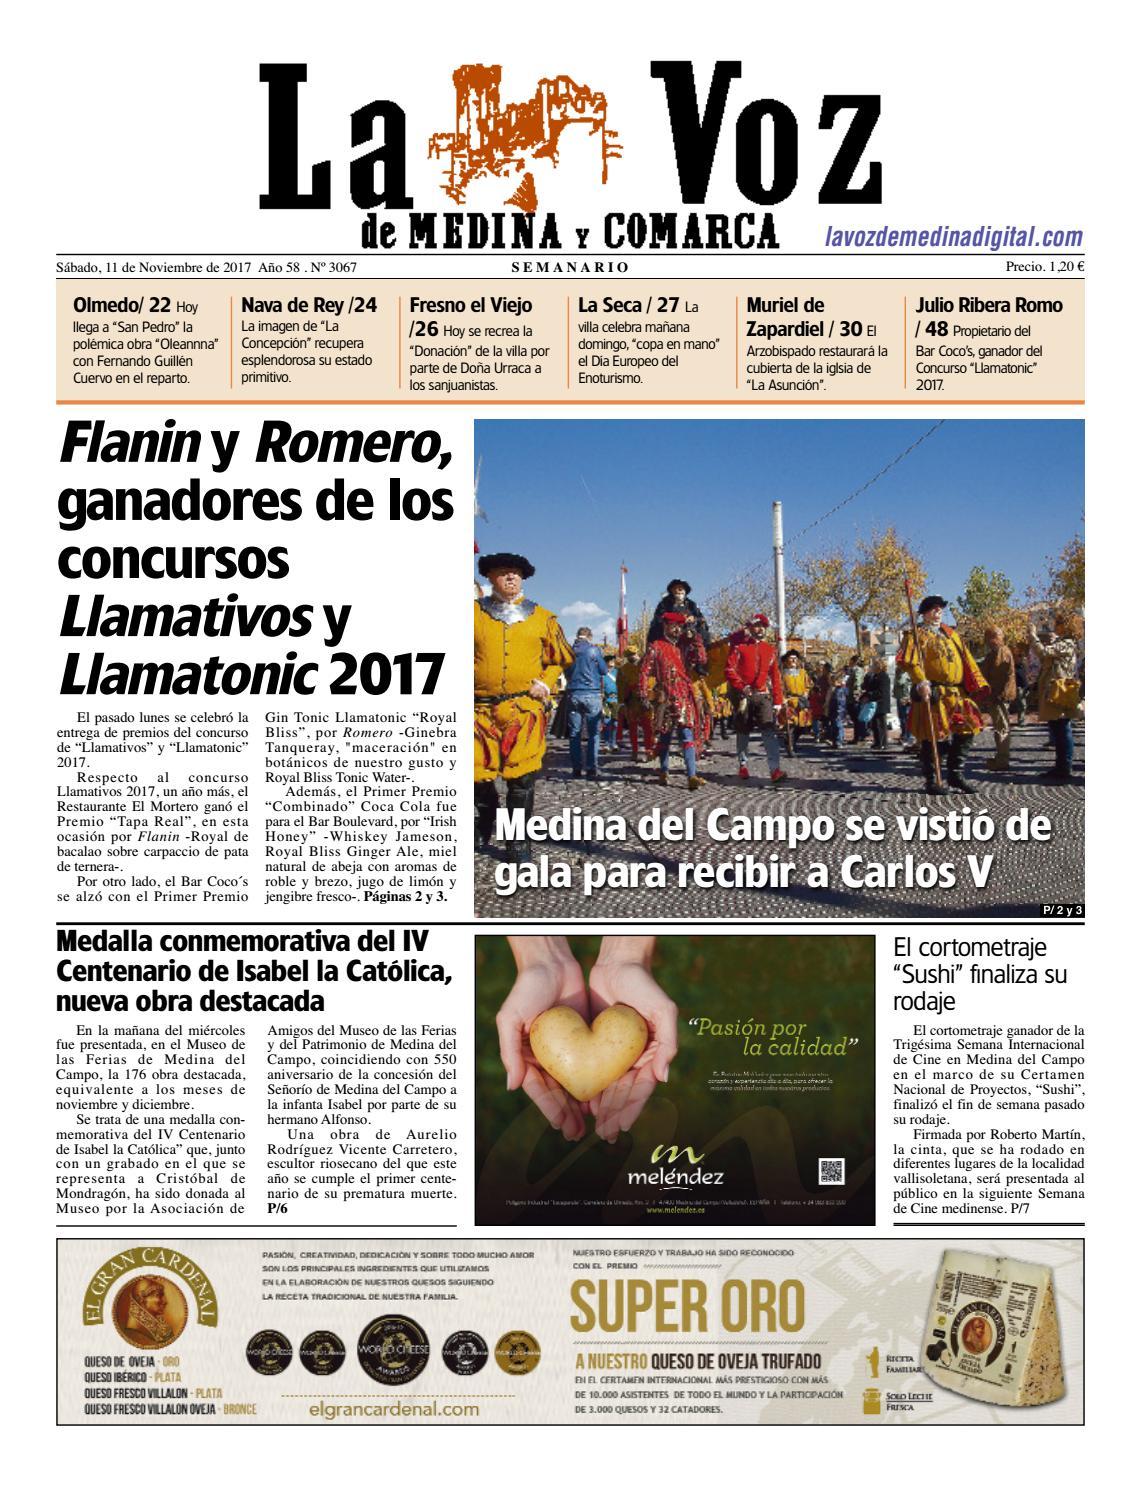 La Voz de Medina171111 by La Voz de Medina - issuu